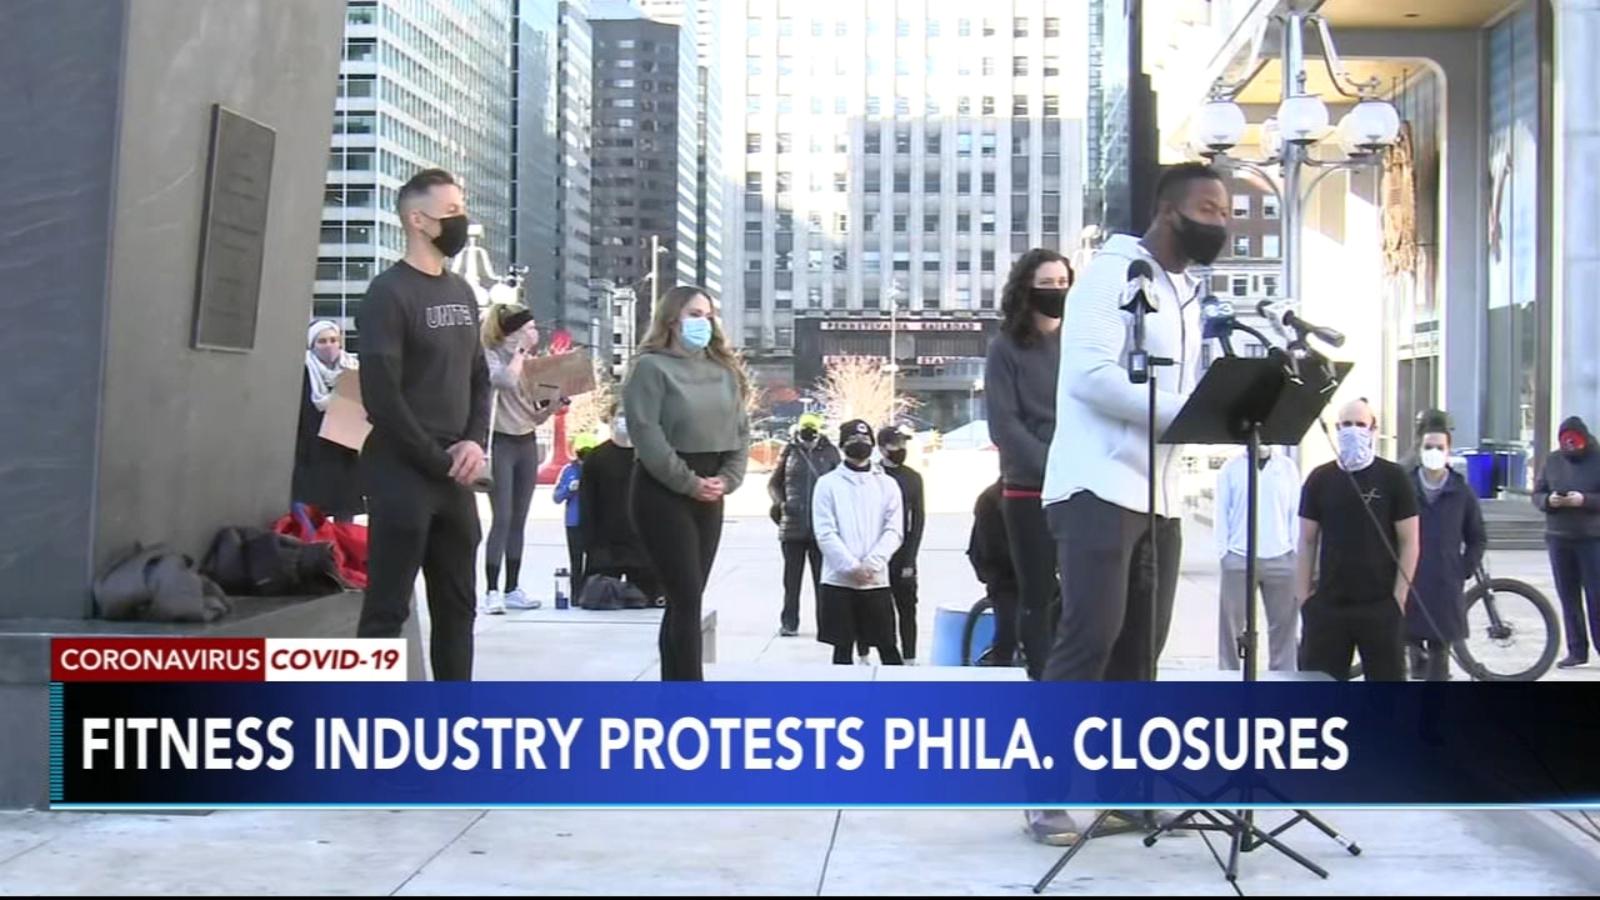 Philadelphia Fitness Coalition protesting restrictions on city gyms amid coronavirus pandemic